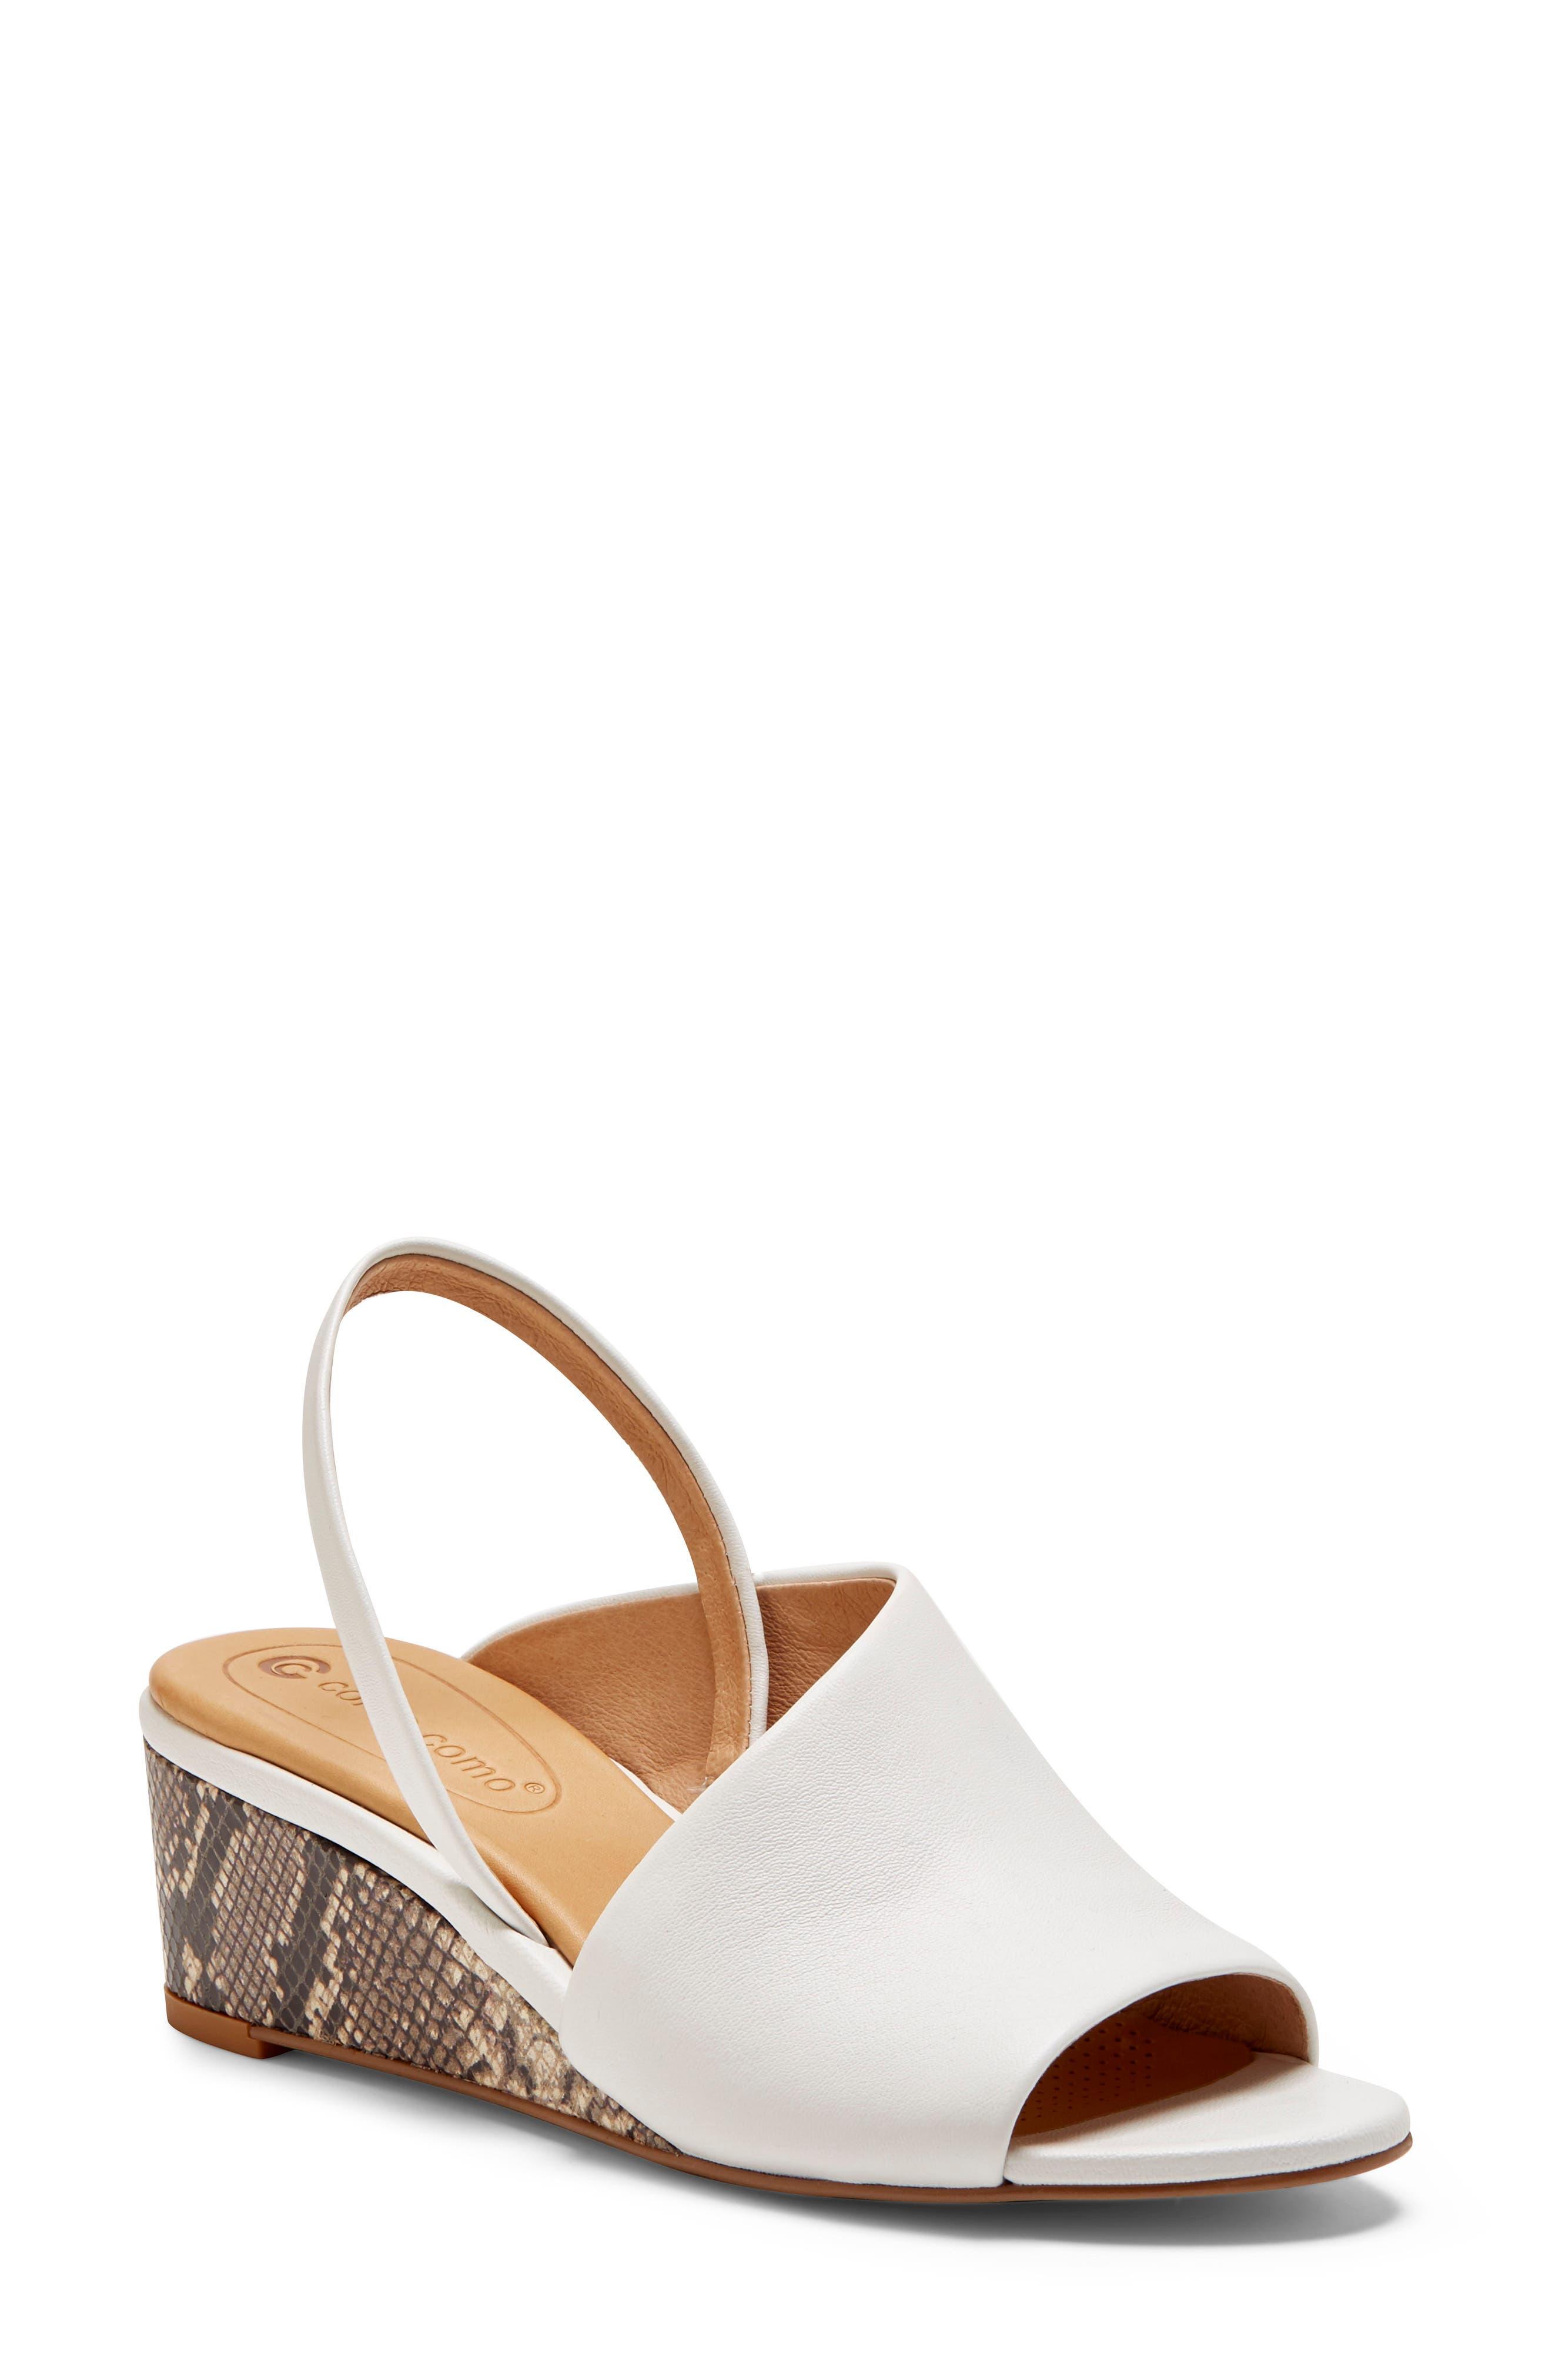 Women's Cc Corso Como Ritah Slingback Sandal